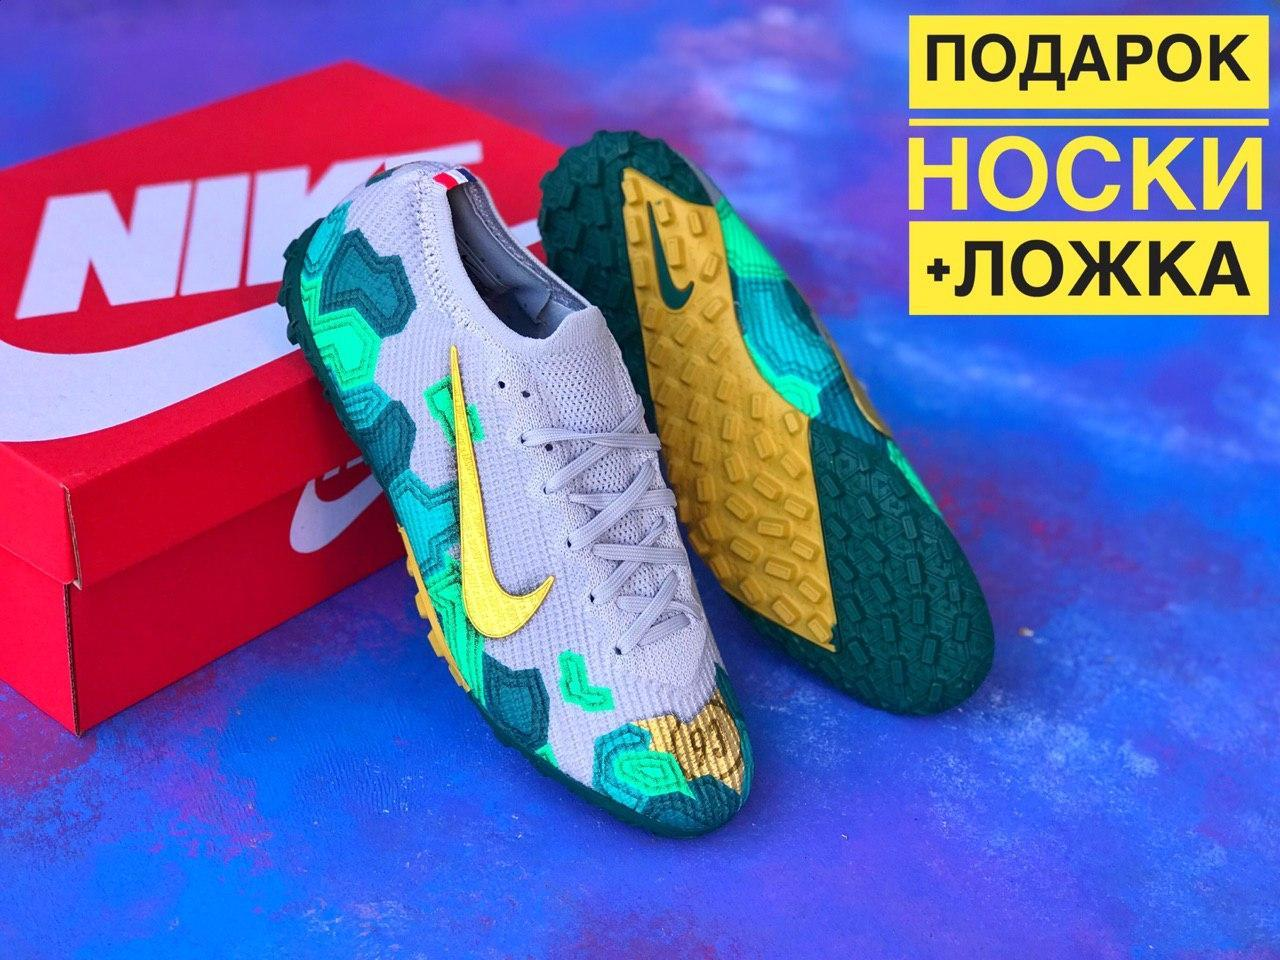 Сороконожки Килиана Мбаппе Nike Mercurial Superfly 7 найк меркуриал суперфлай бампы